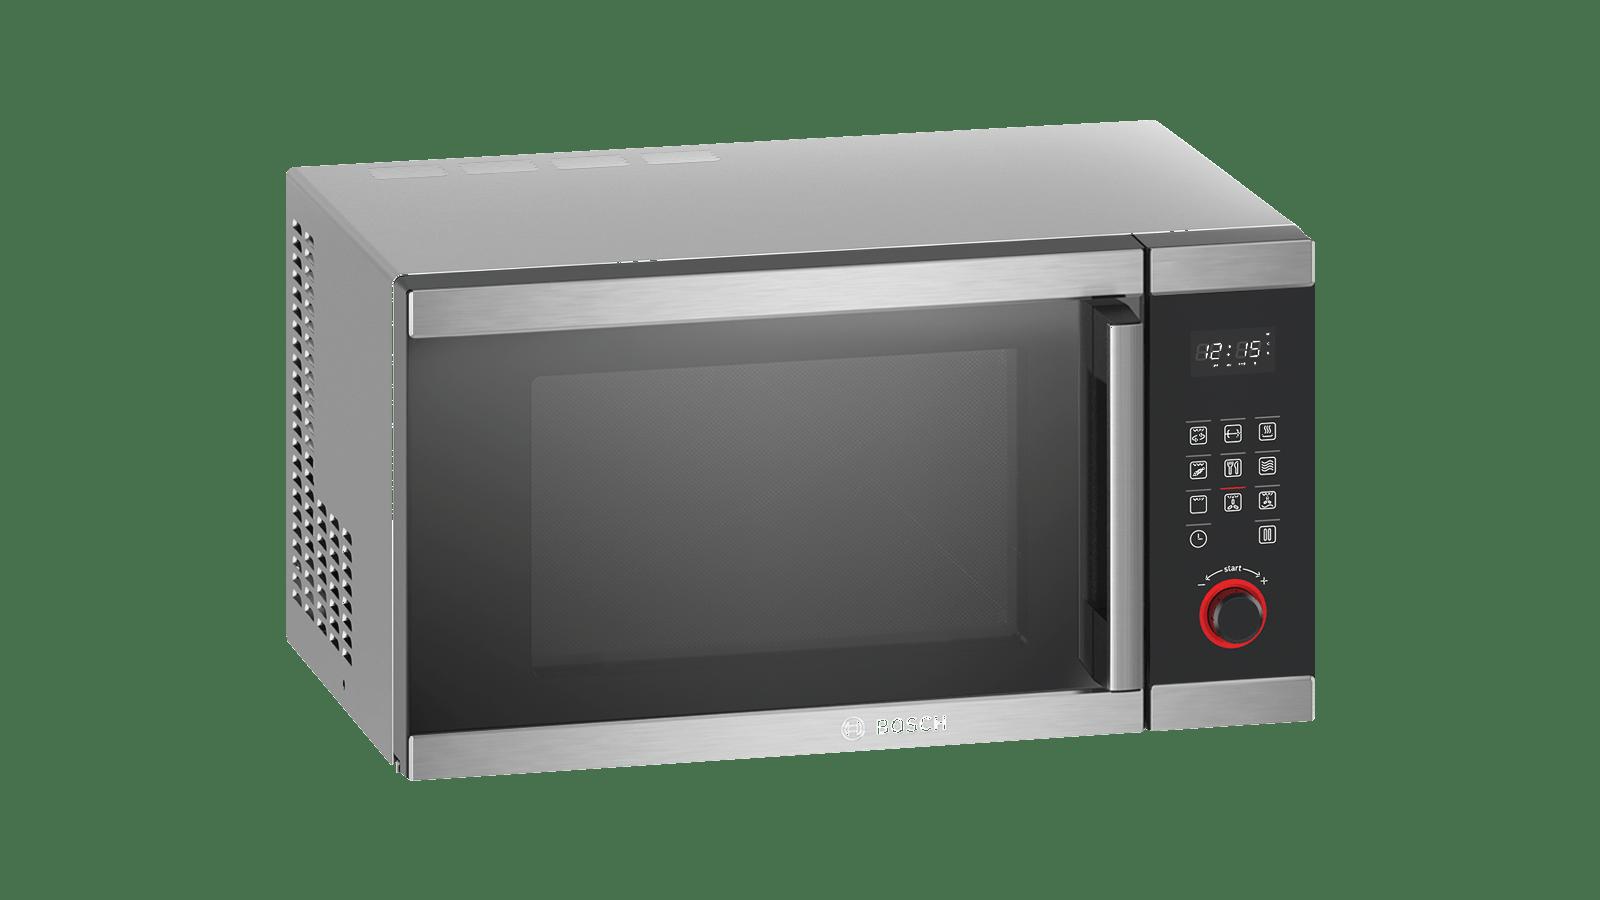 bosch hmb45c453x microwave oven